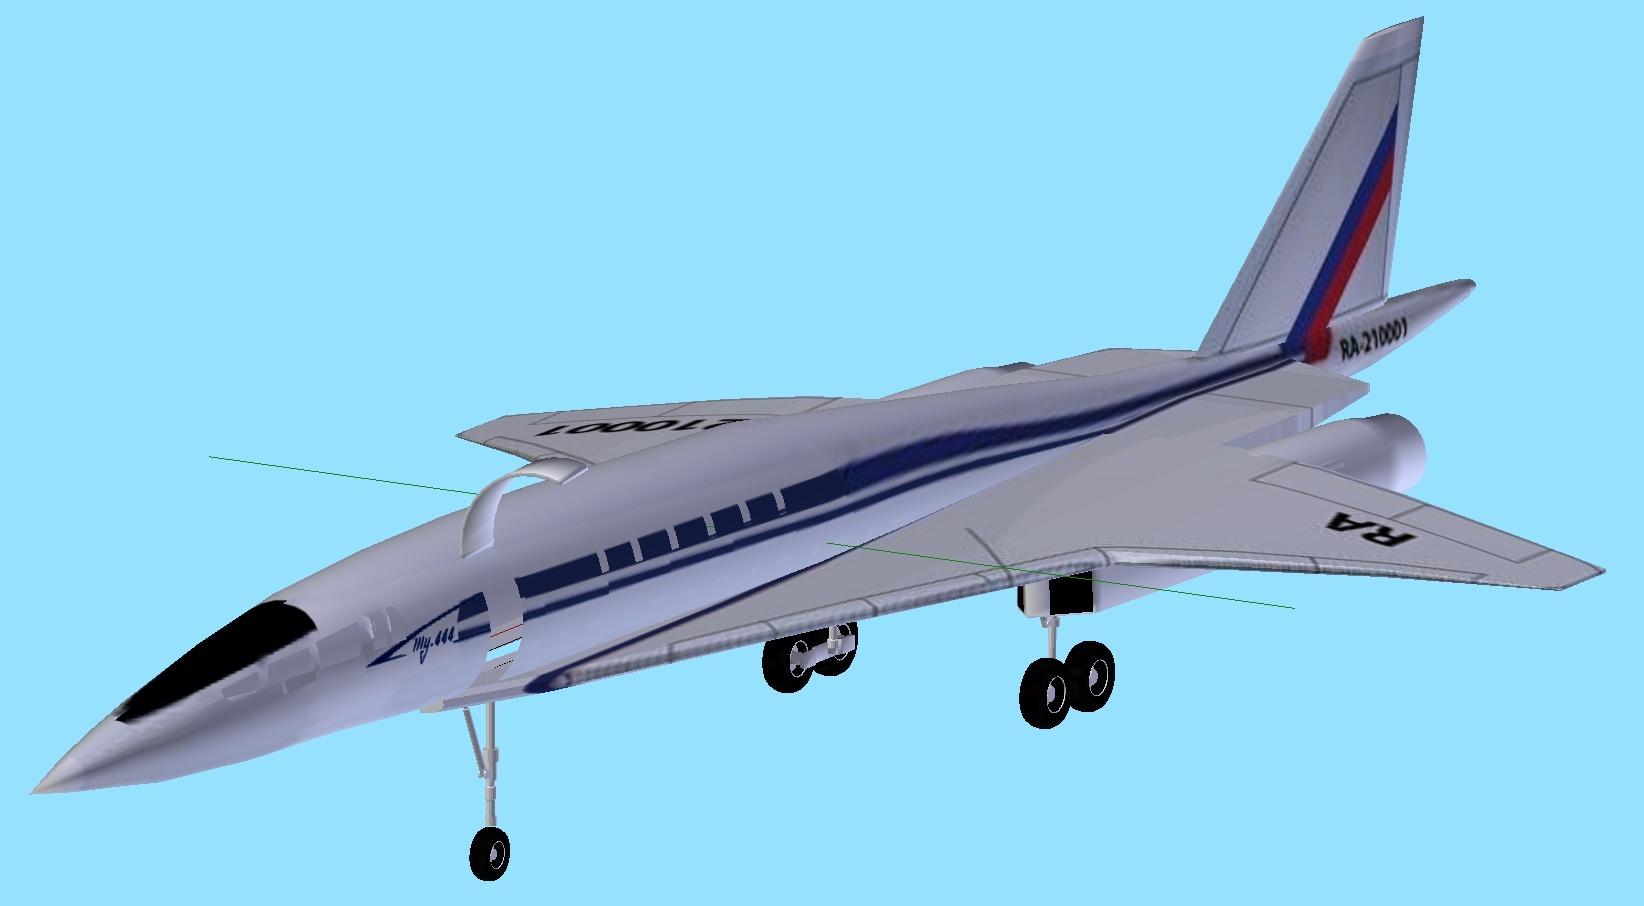 Flightgear Forum View Topic Tupolev 444 Ssbj Versus